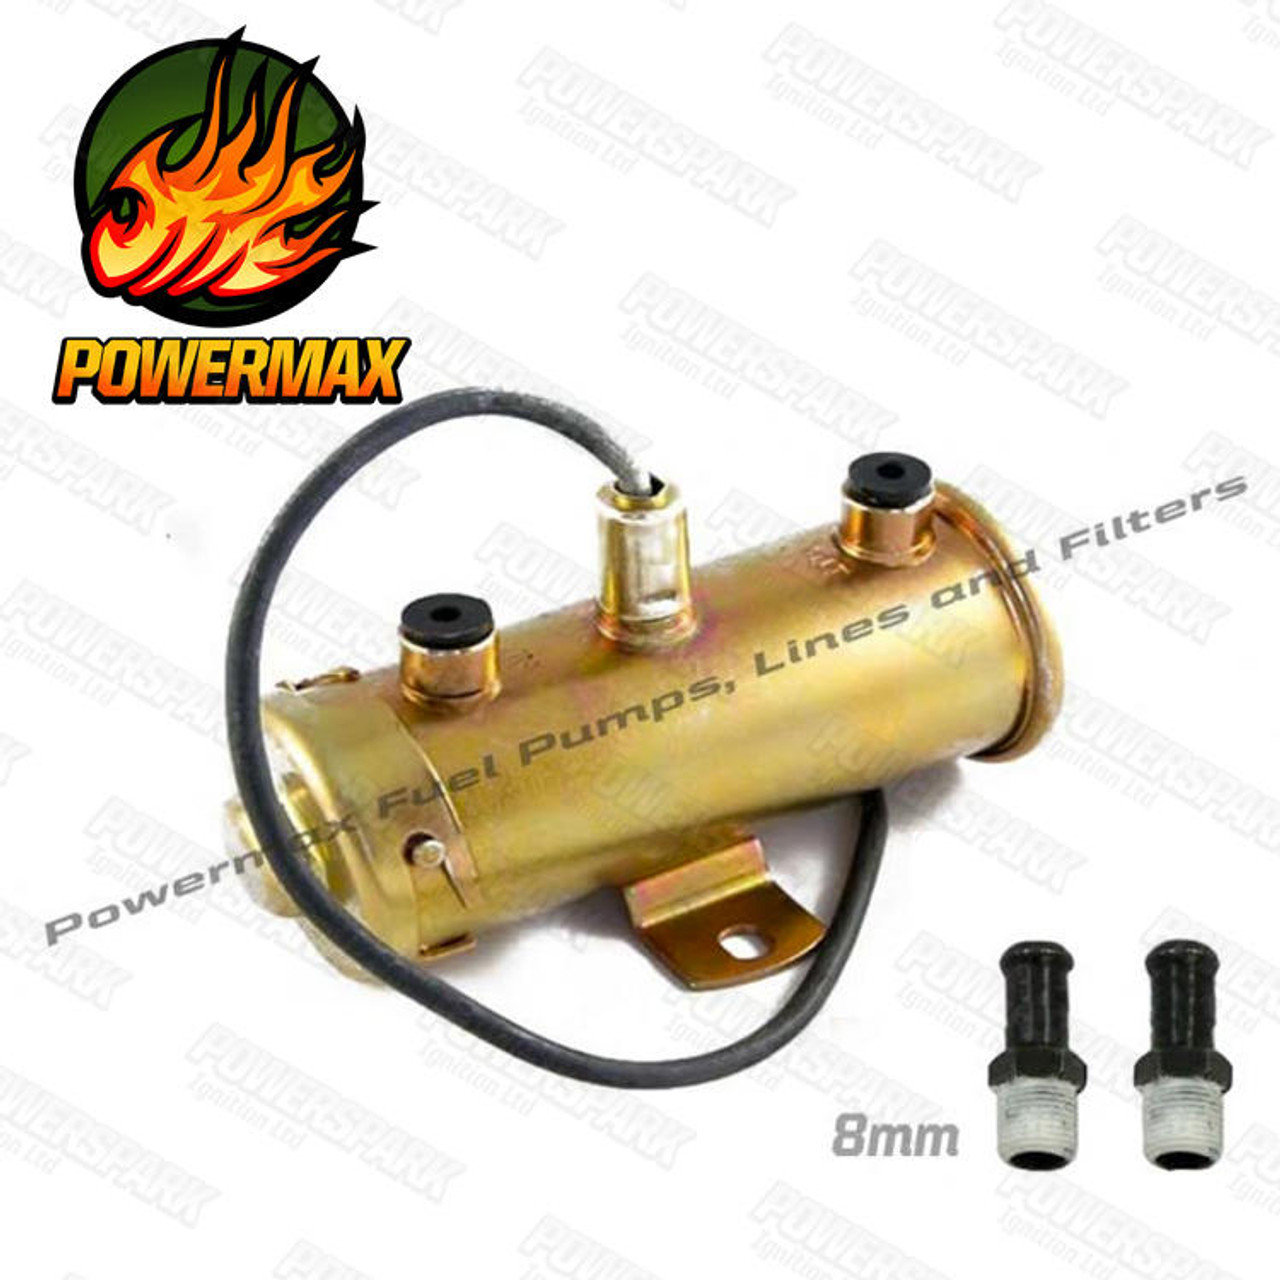 Powermax Powermax FP3 Electronic Fuel Pump replaces PRC3901 Negative Earth